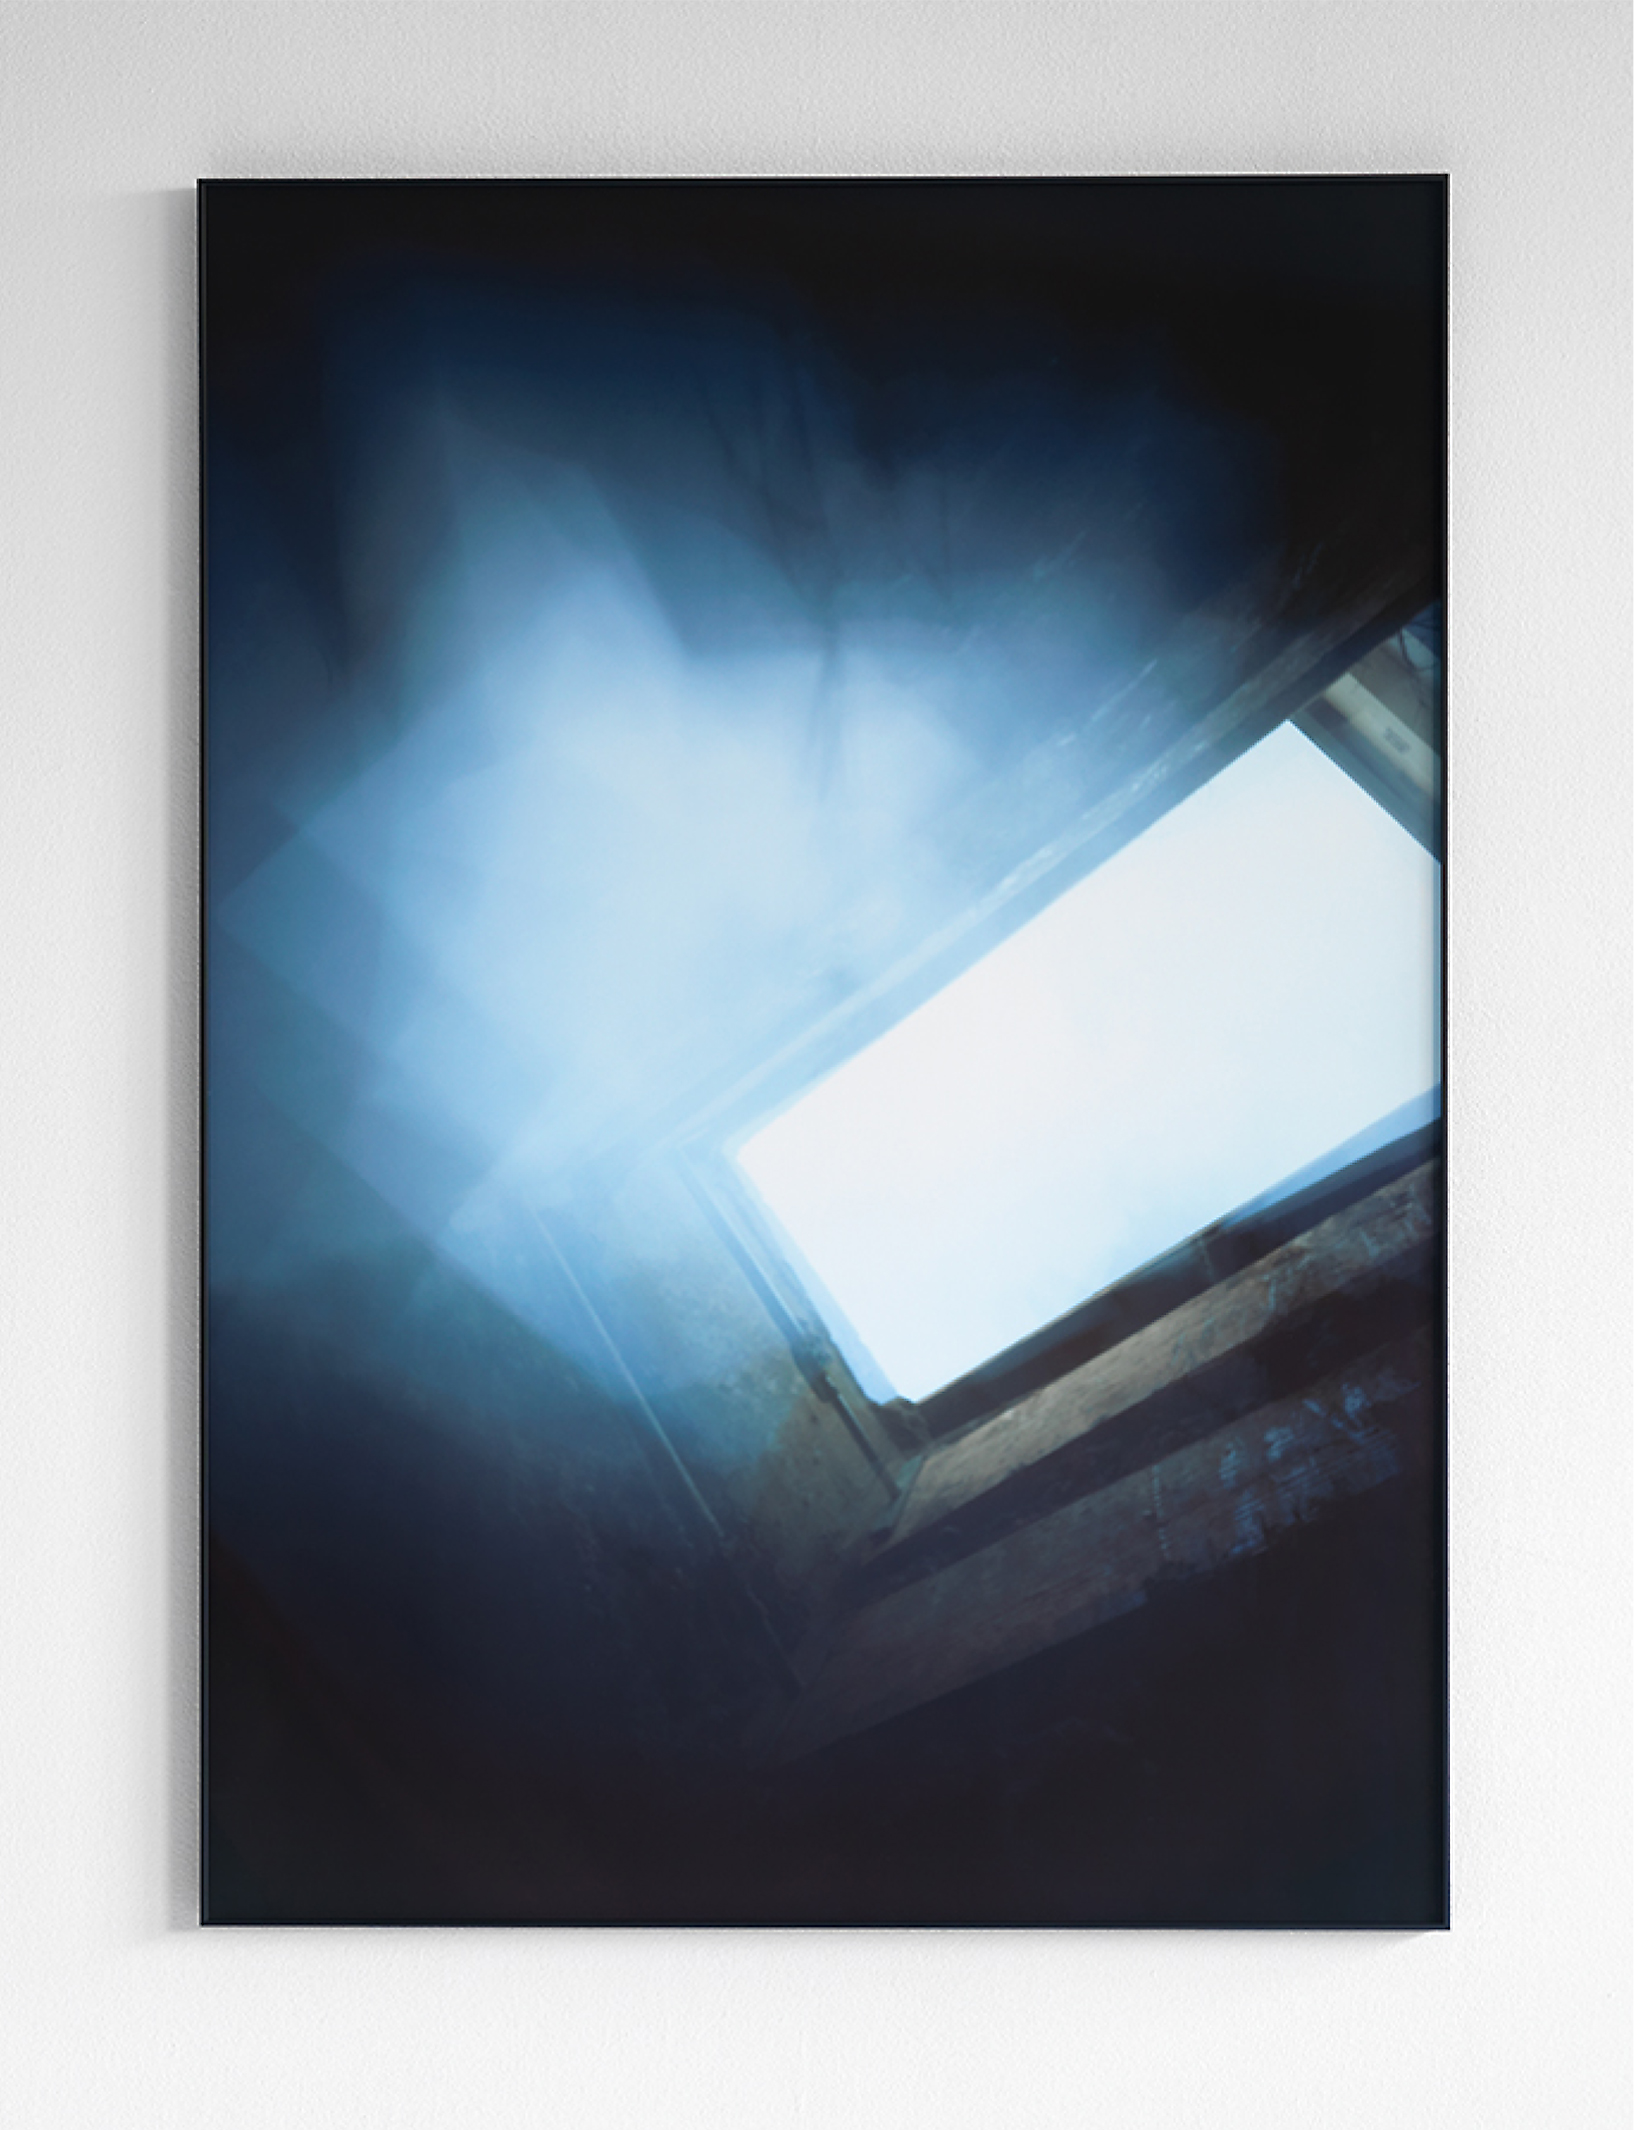 How much heaven does a man need? (2001) - Bernhard Müller